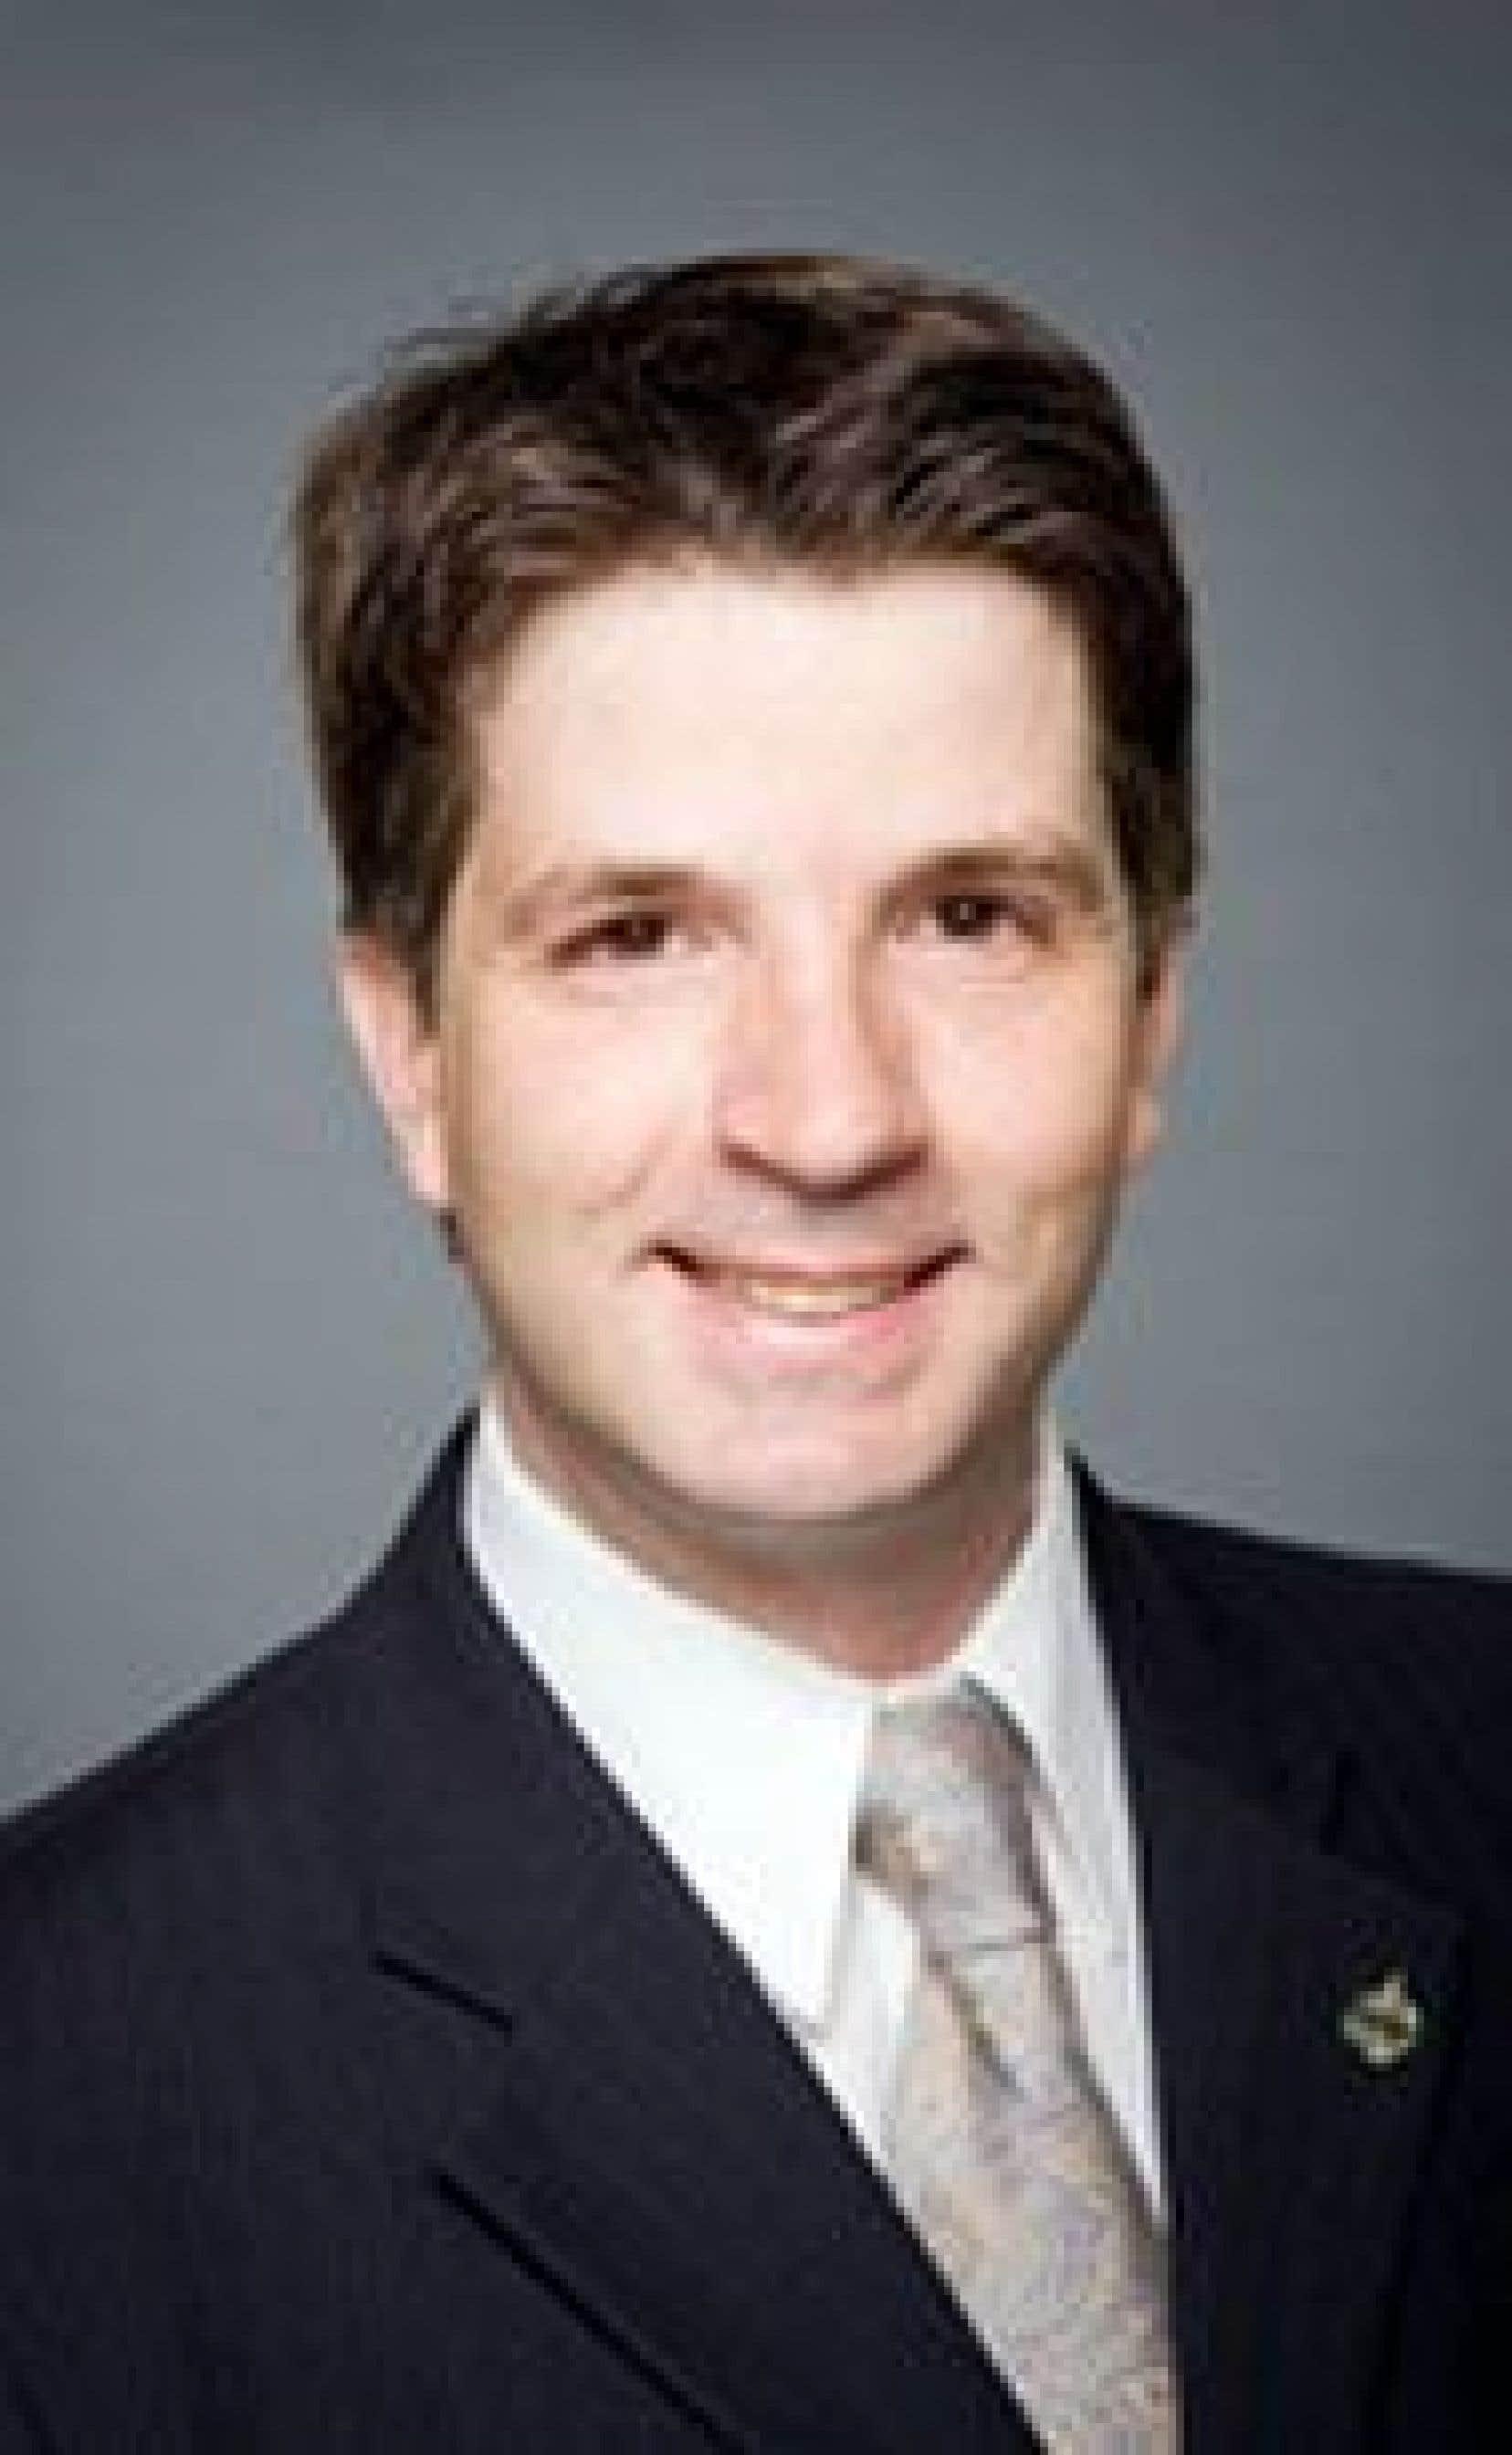 Jean-François Fortin